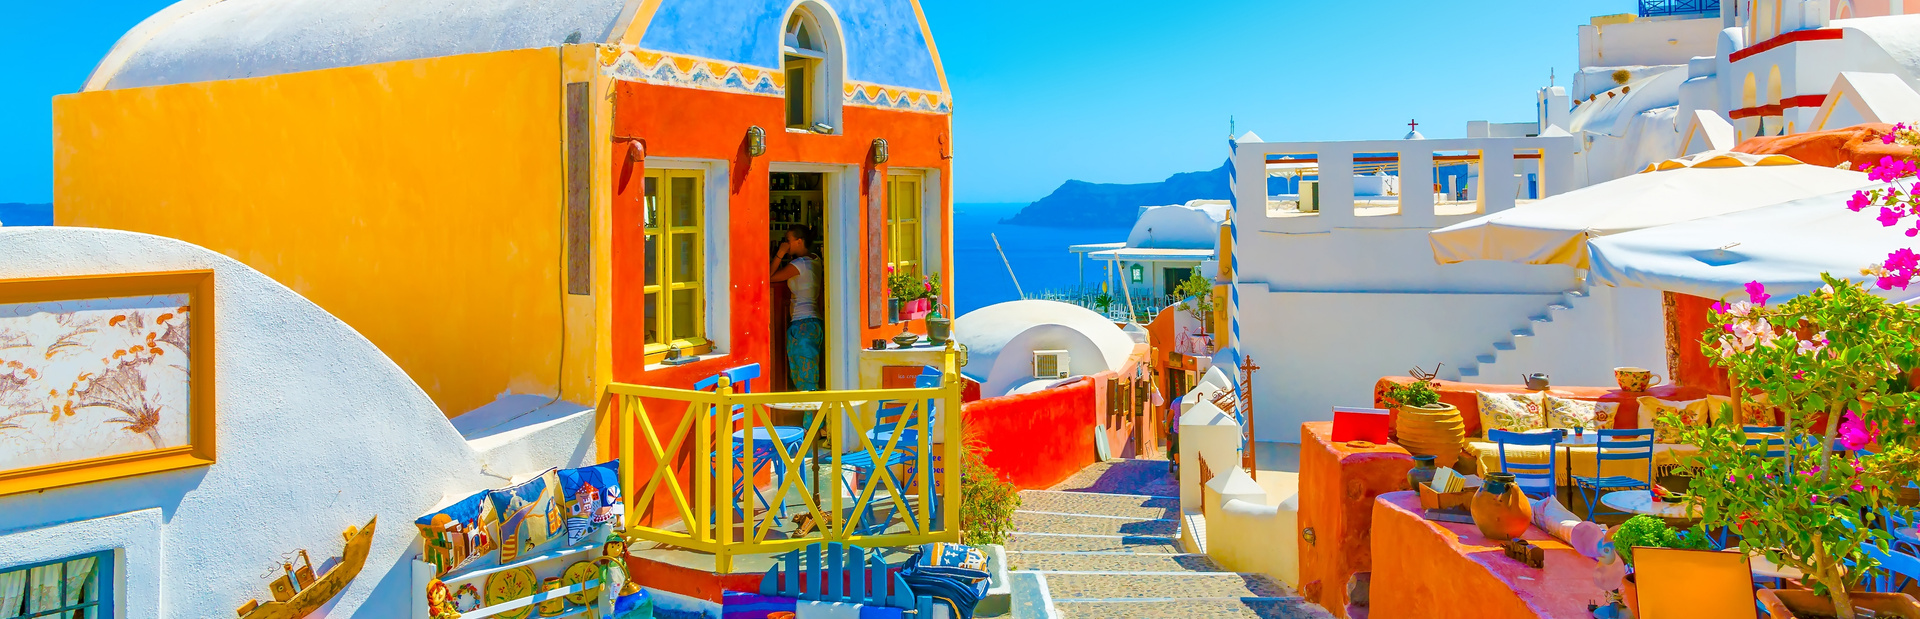 East Mediterranean news photo